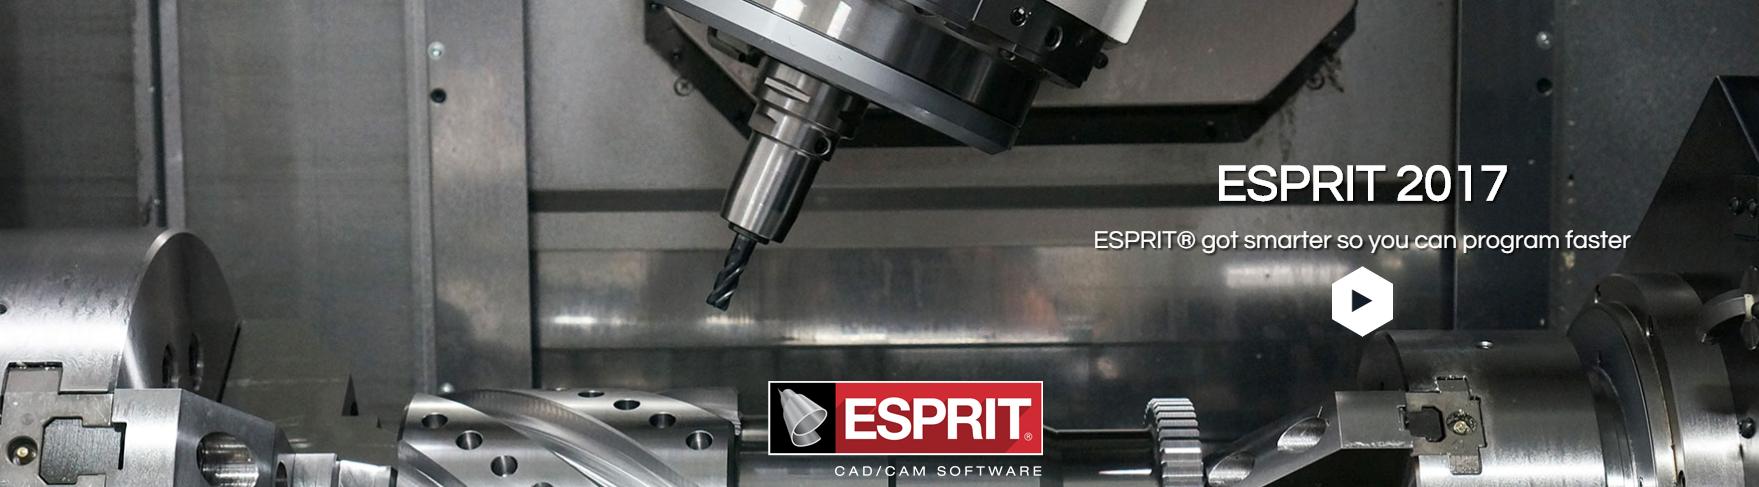 ESPRIT-2015-launch-banner-